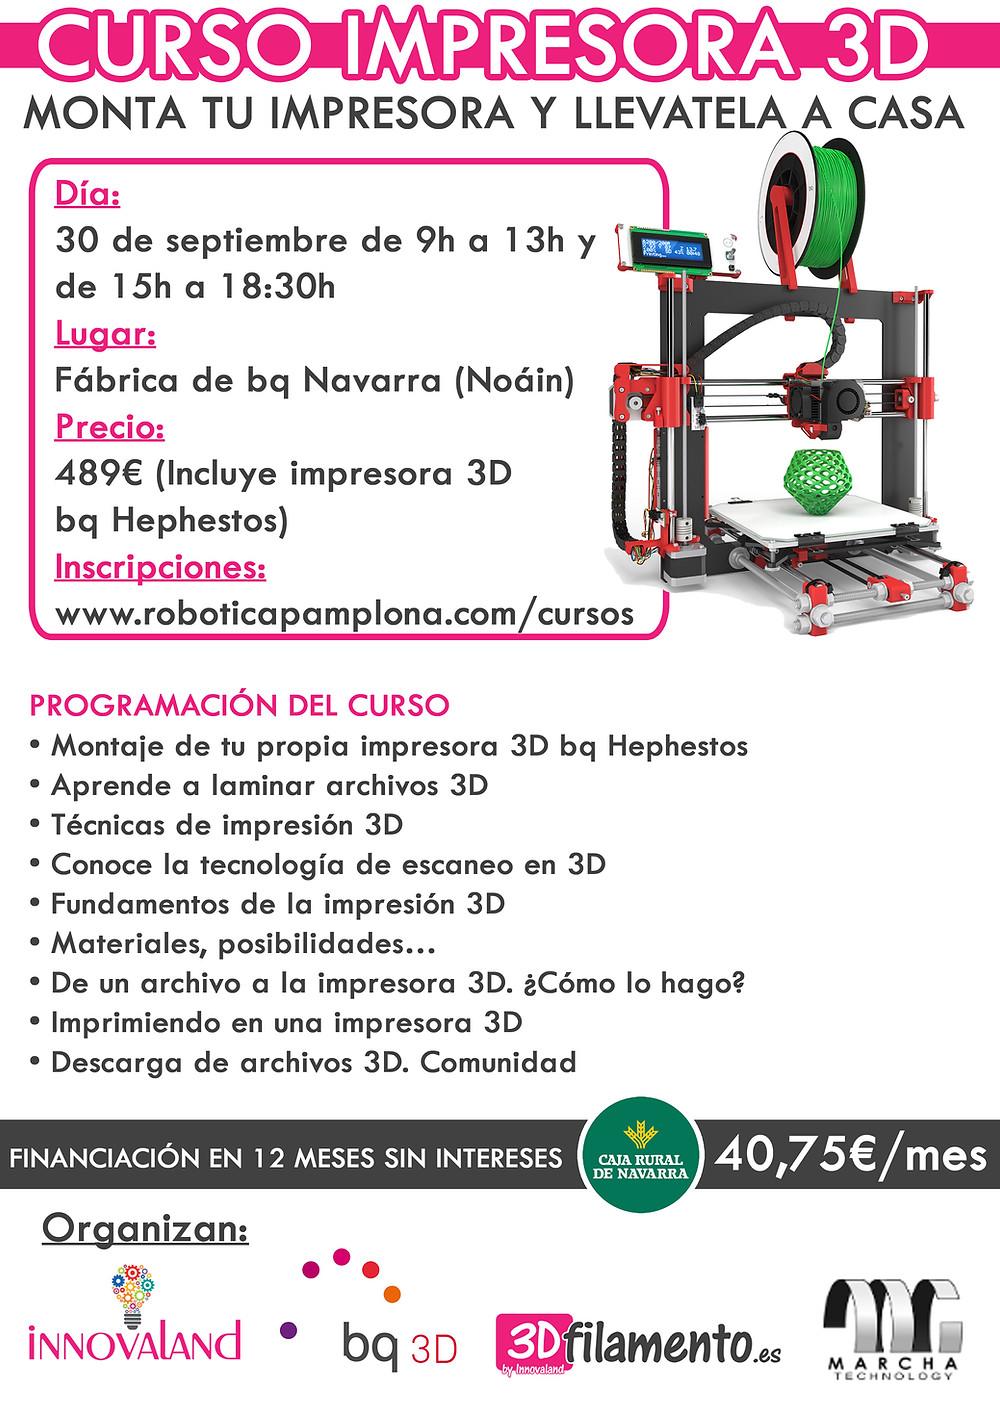 Impresora 3D Pamplona